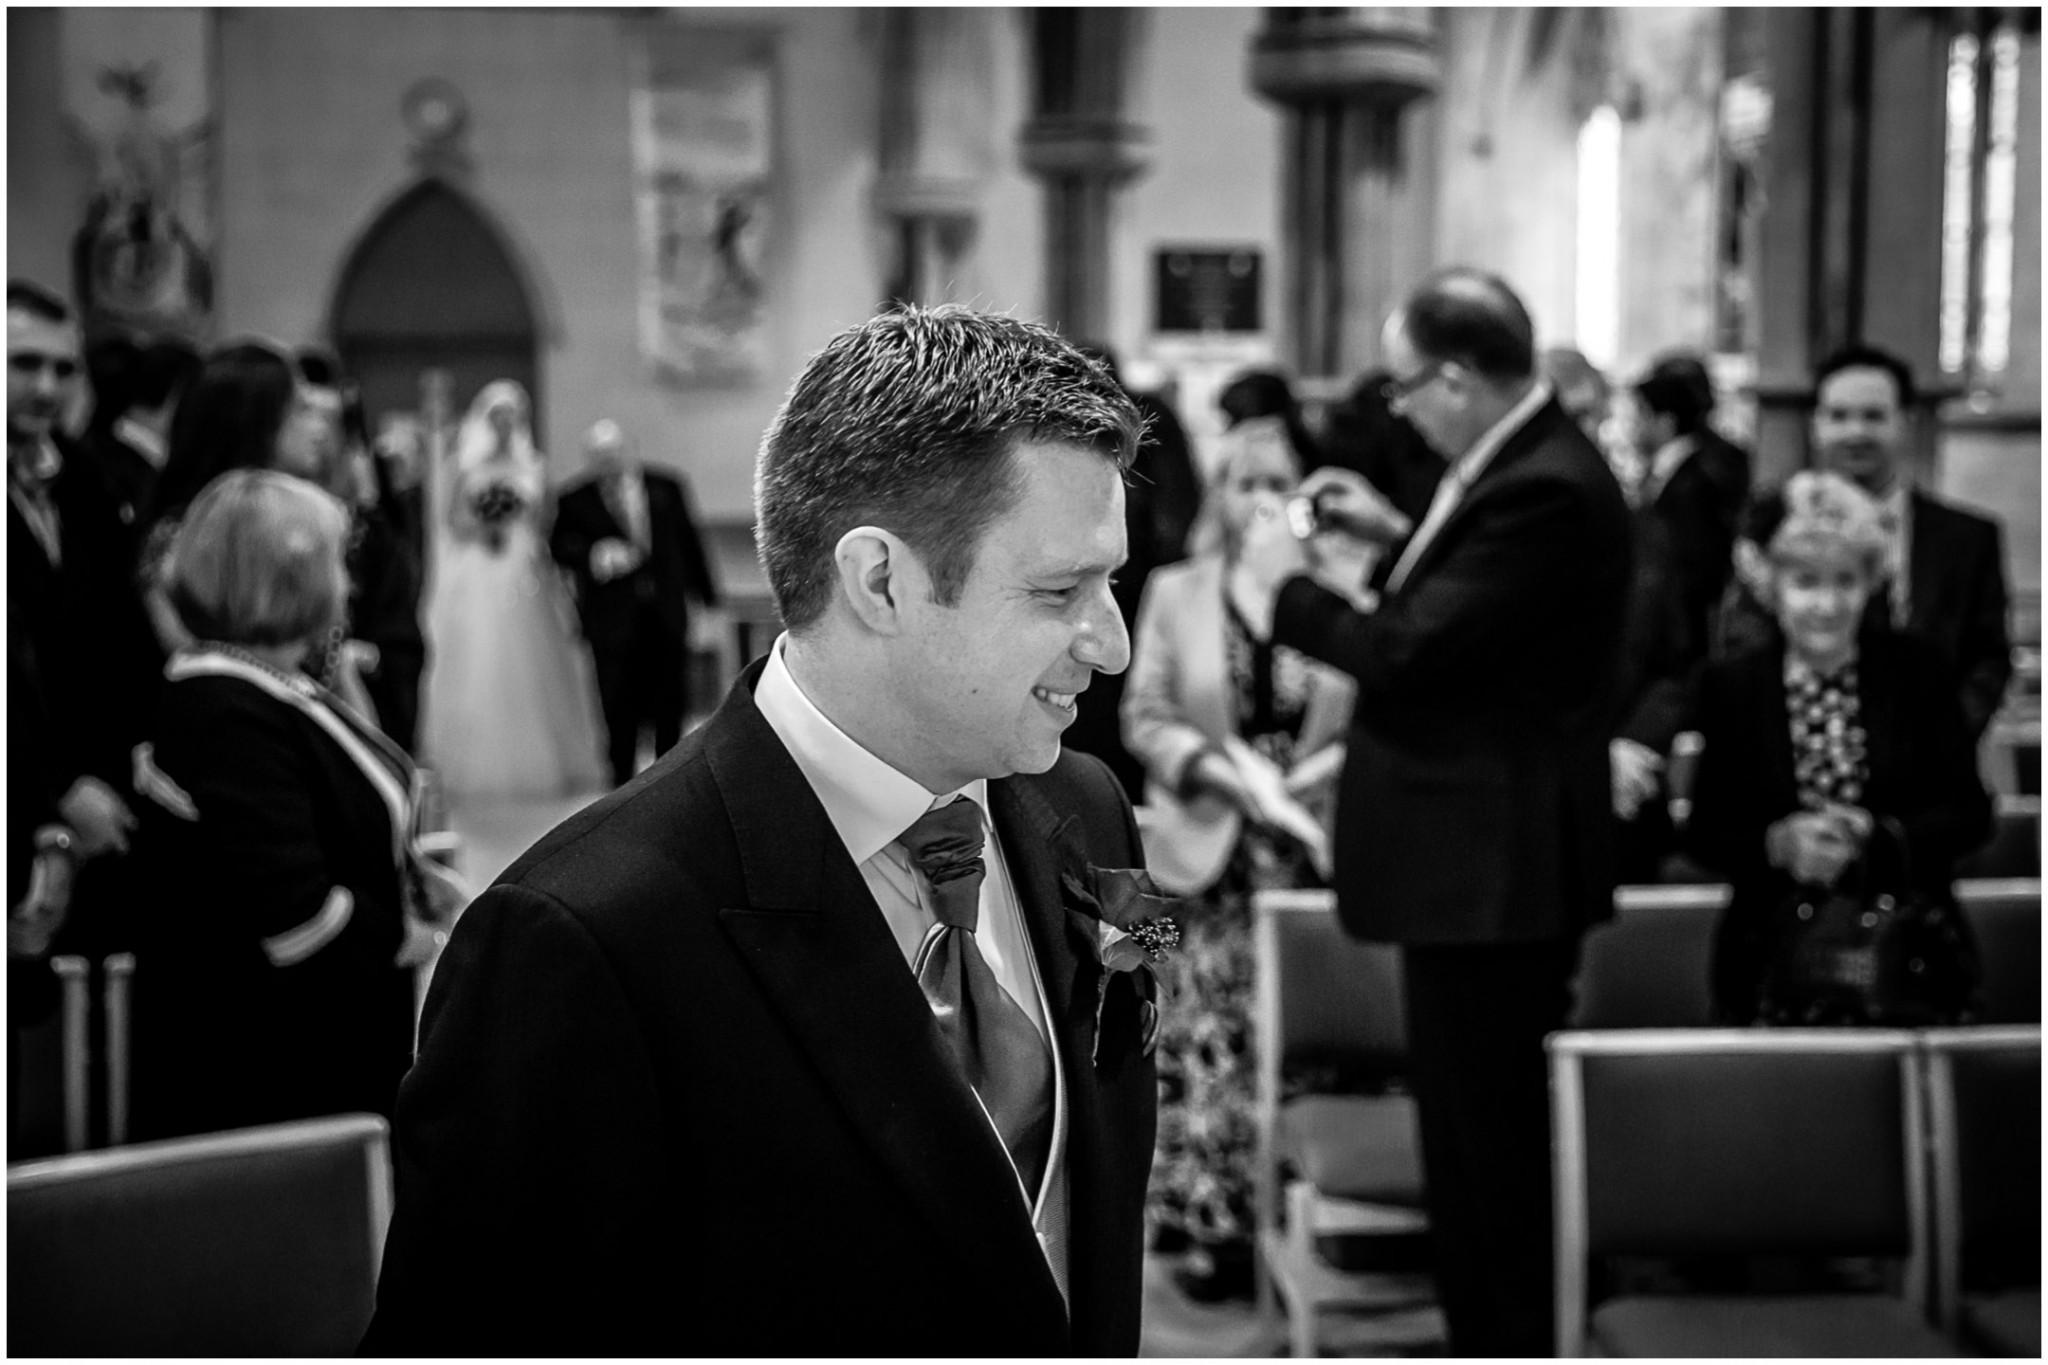 St Saviours Church Brockenhurst Bride walking down aisle